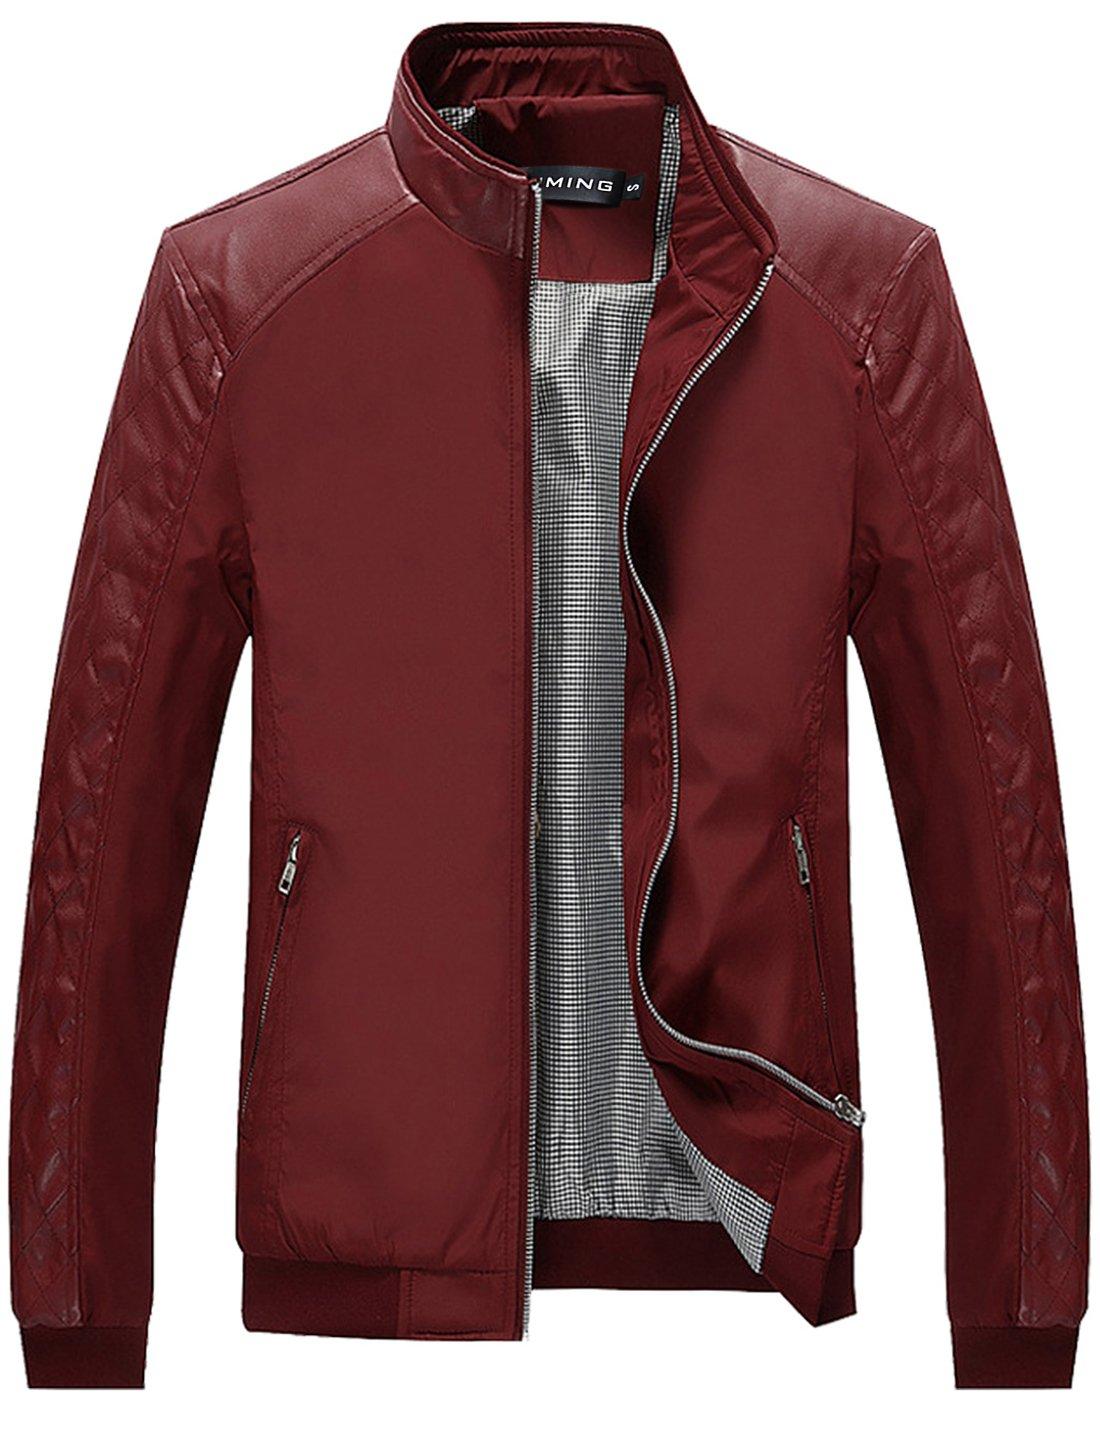 Tanming Men's Color Block Slim Casual Jacket (Small, Red) by Tanming